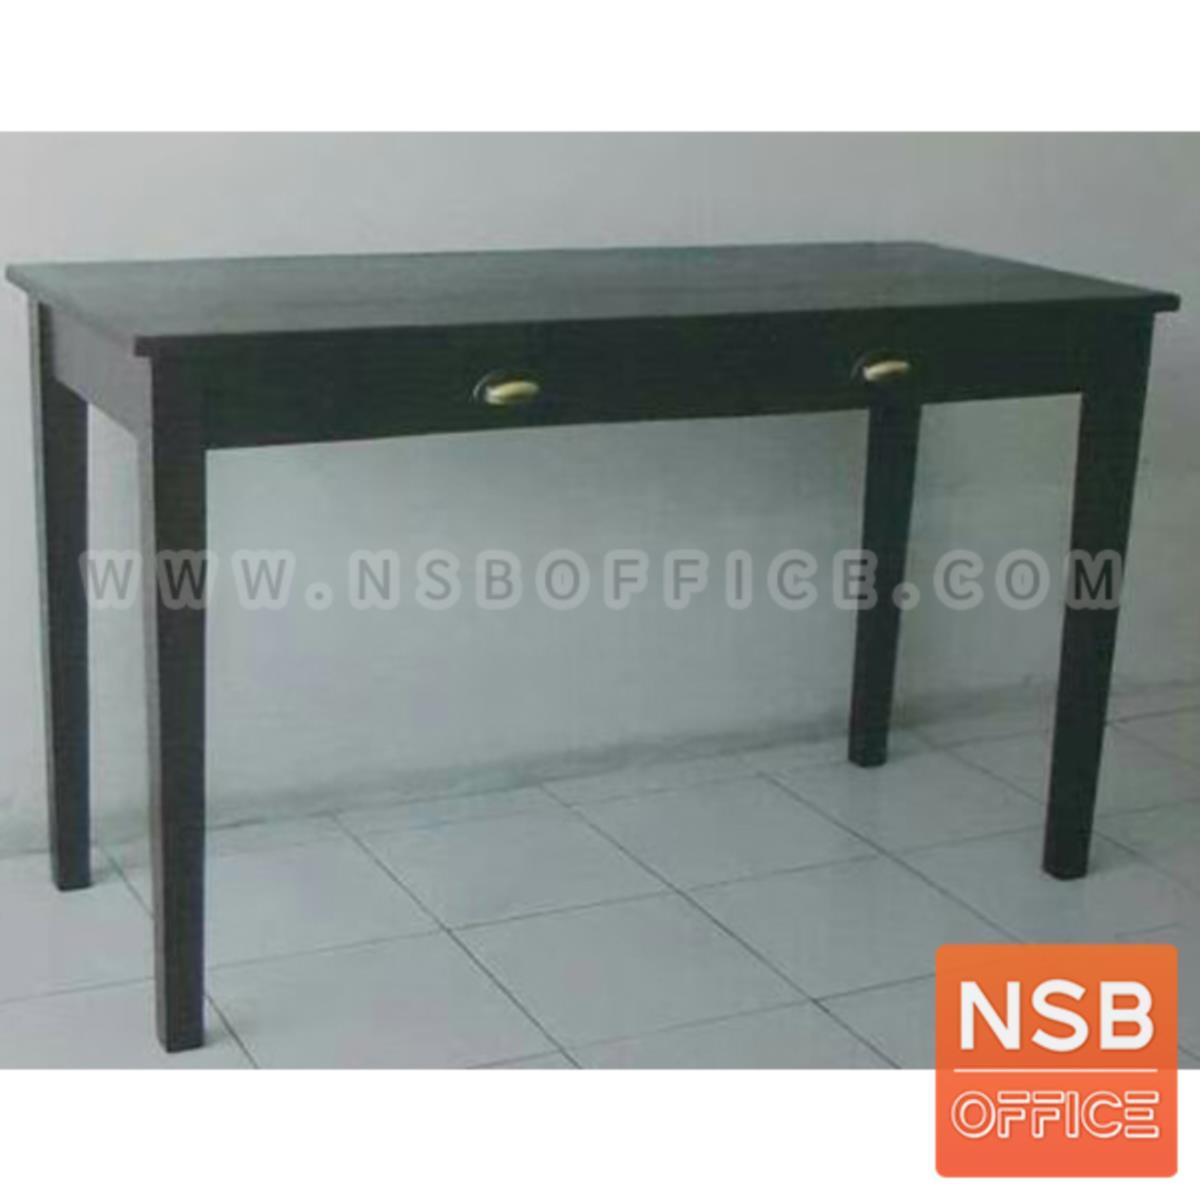 G20A003:โต๊ะเหลี่ยมไม้ยางพารา 2 ลิ้นชัก รุ่น Ben (เบน) ขนาด 120W*50D*75H cm.